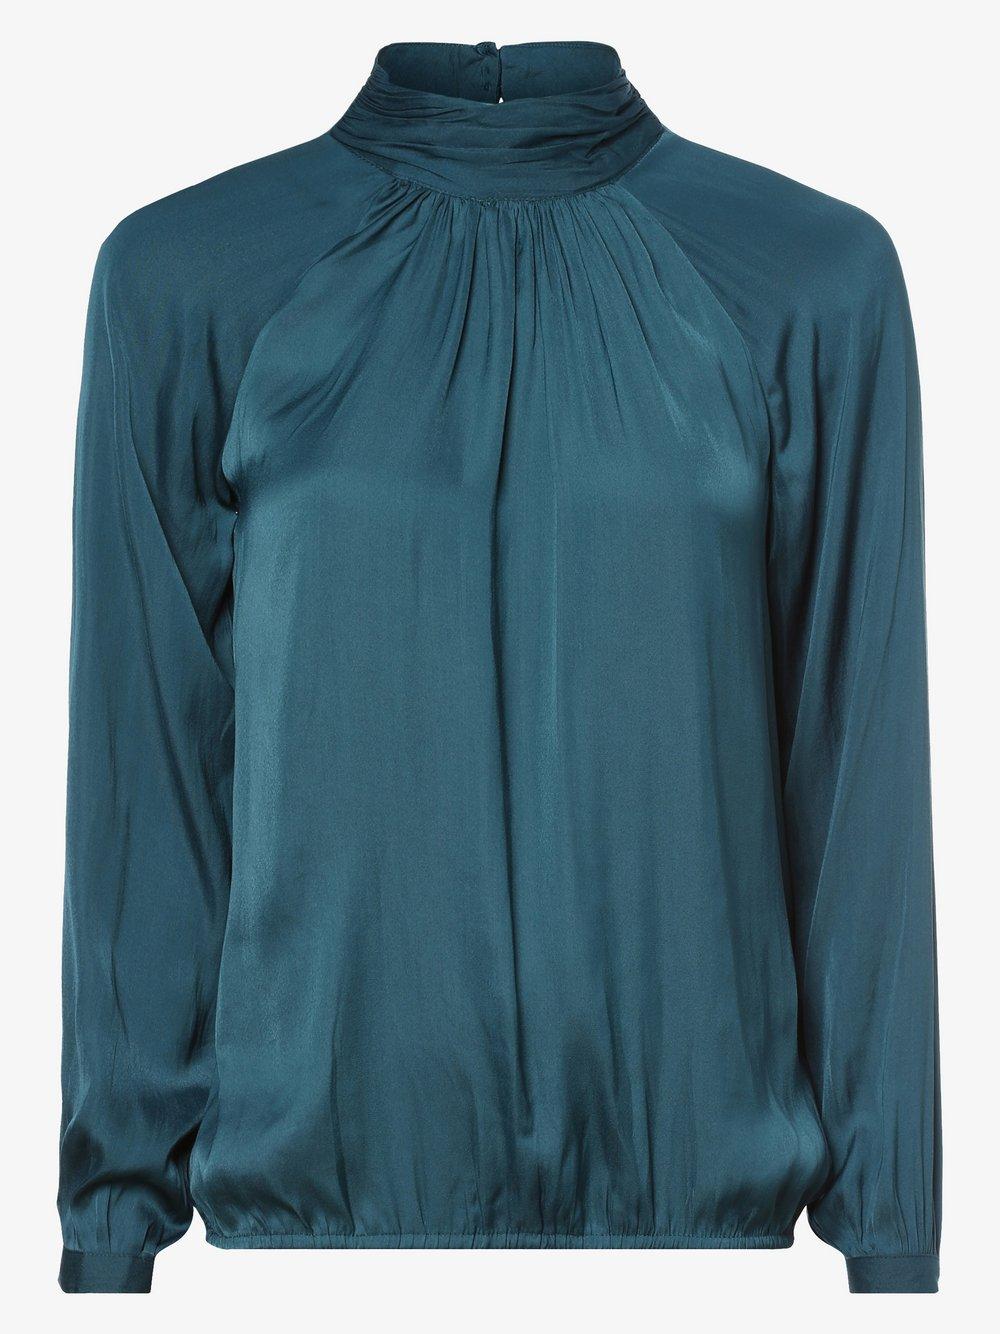 soyaconcept® – Bluzka damska – Pamela, niebieski Van Graaf 448310-0001-09970